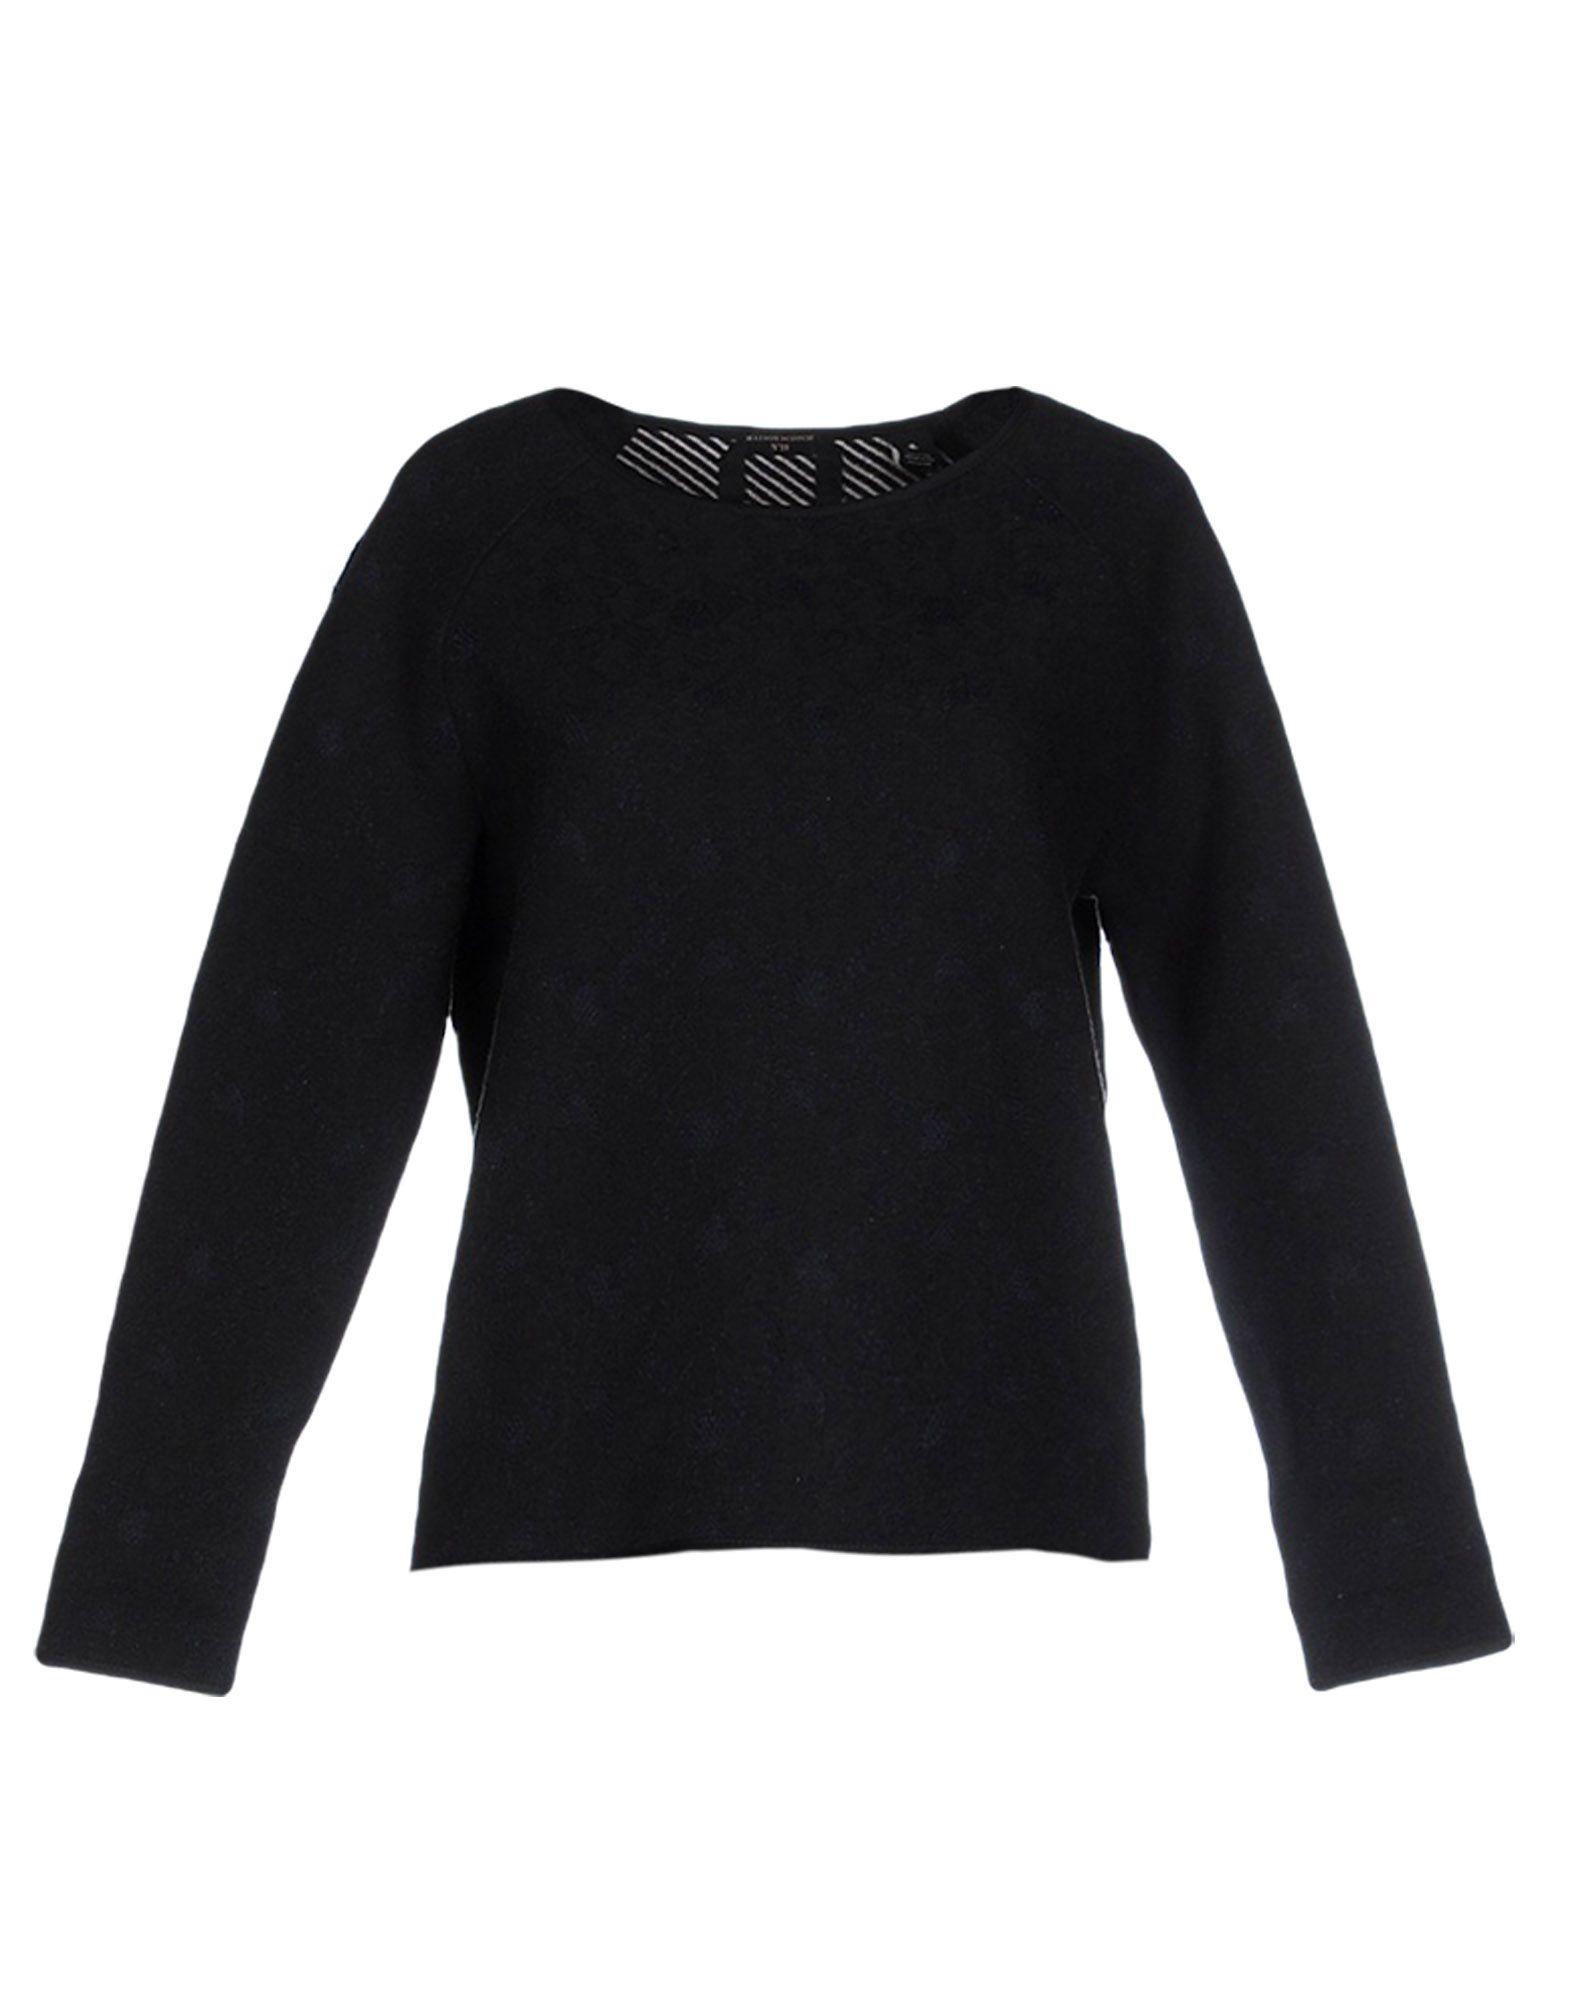 Maison scotch sweatshirt in black lyst for Atelier maison scotch